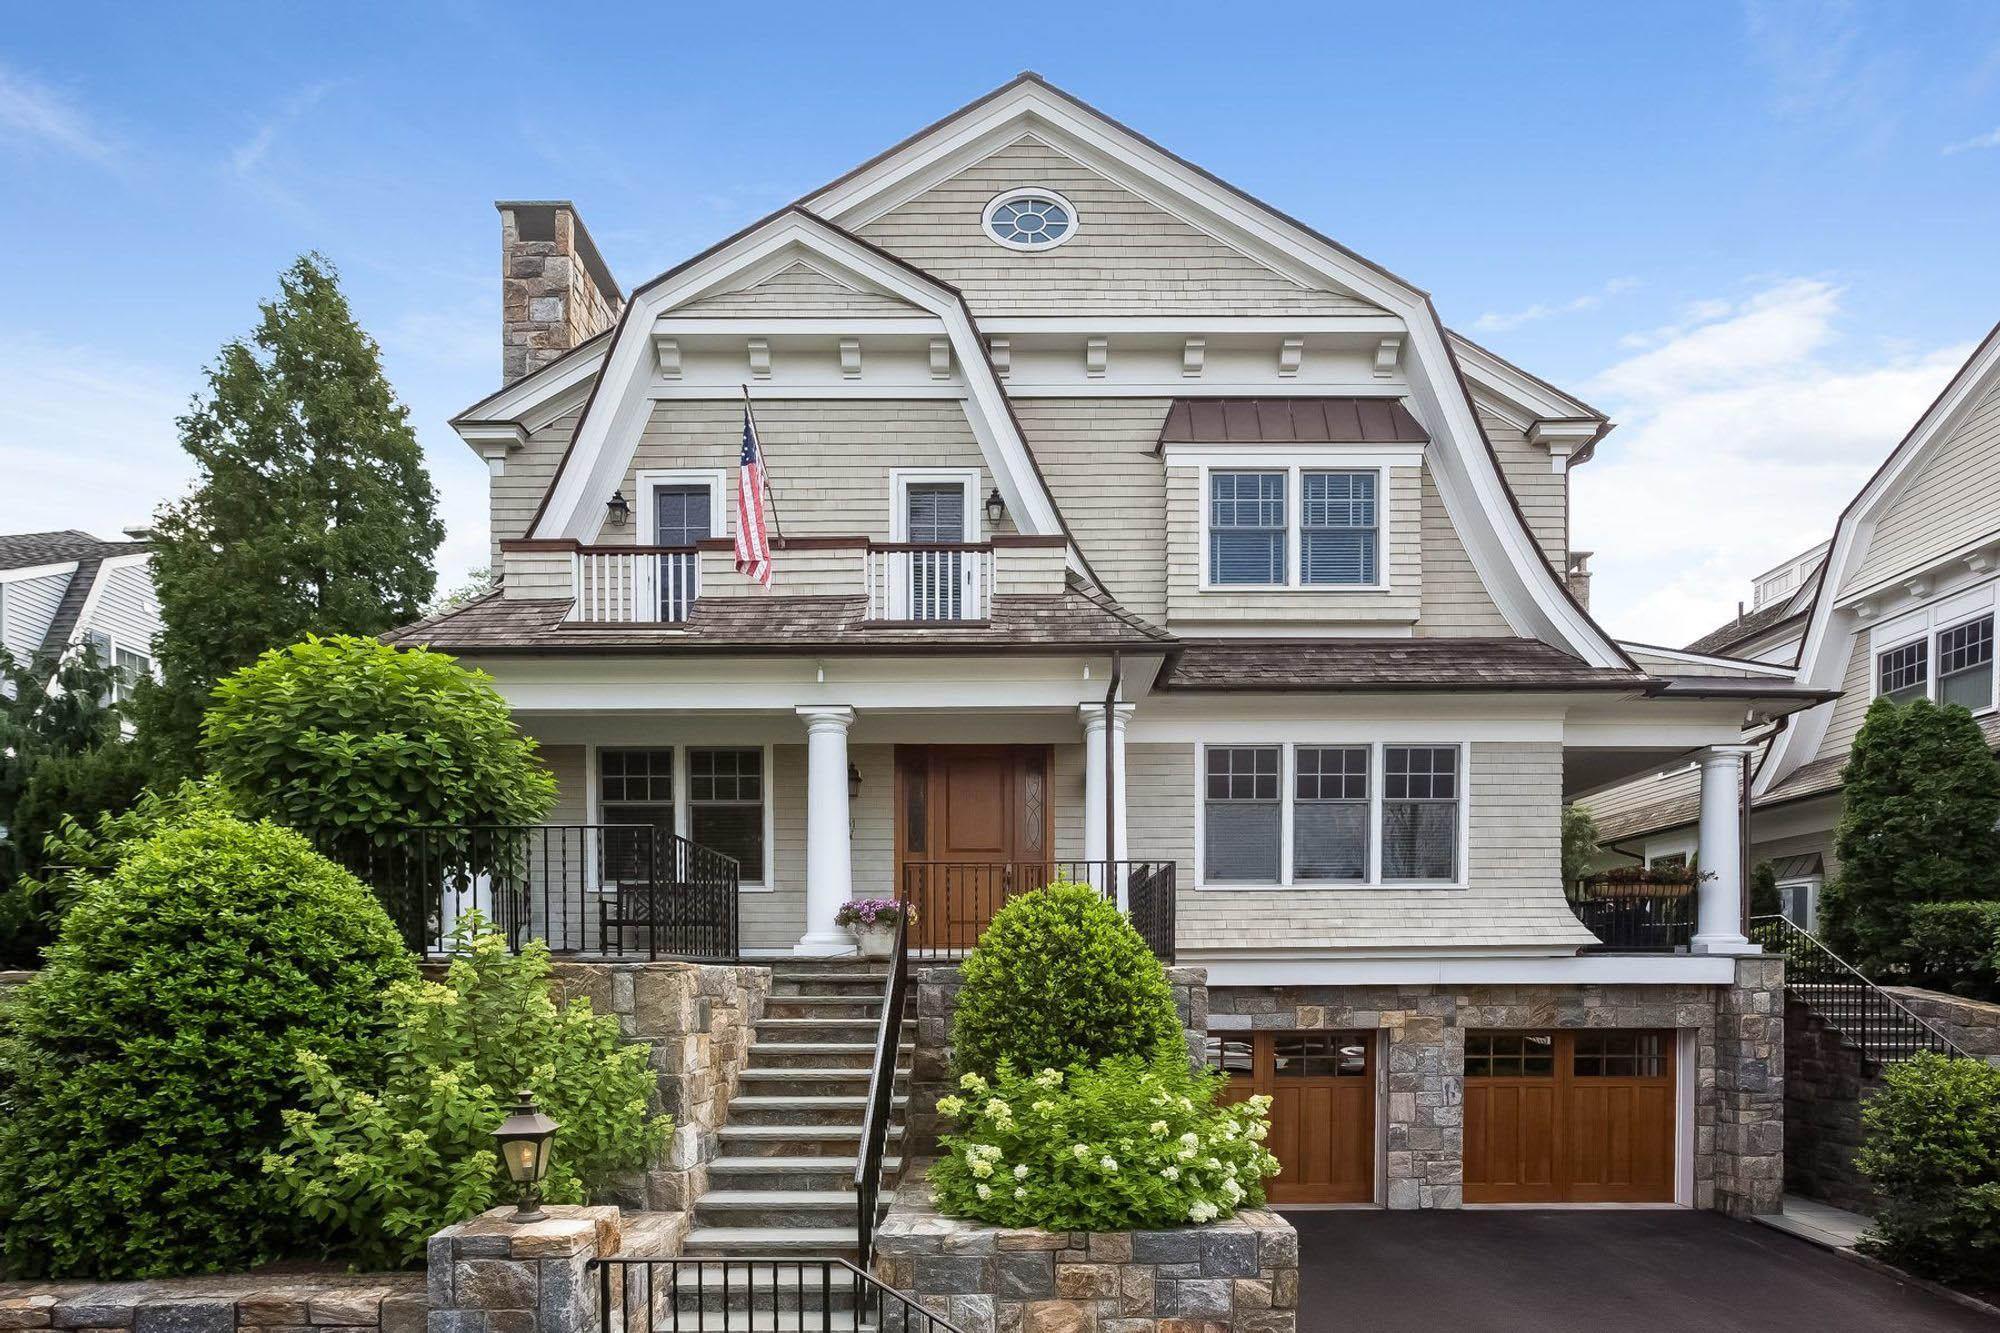 Beautiful custom shingle style home with Azek soffit and fascia. Cream cedar shake siding with real stone veneer.